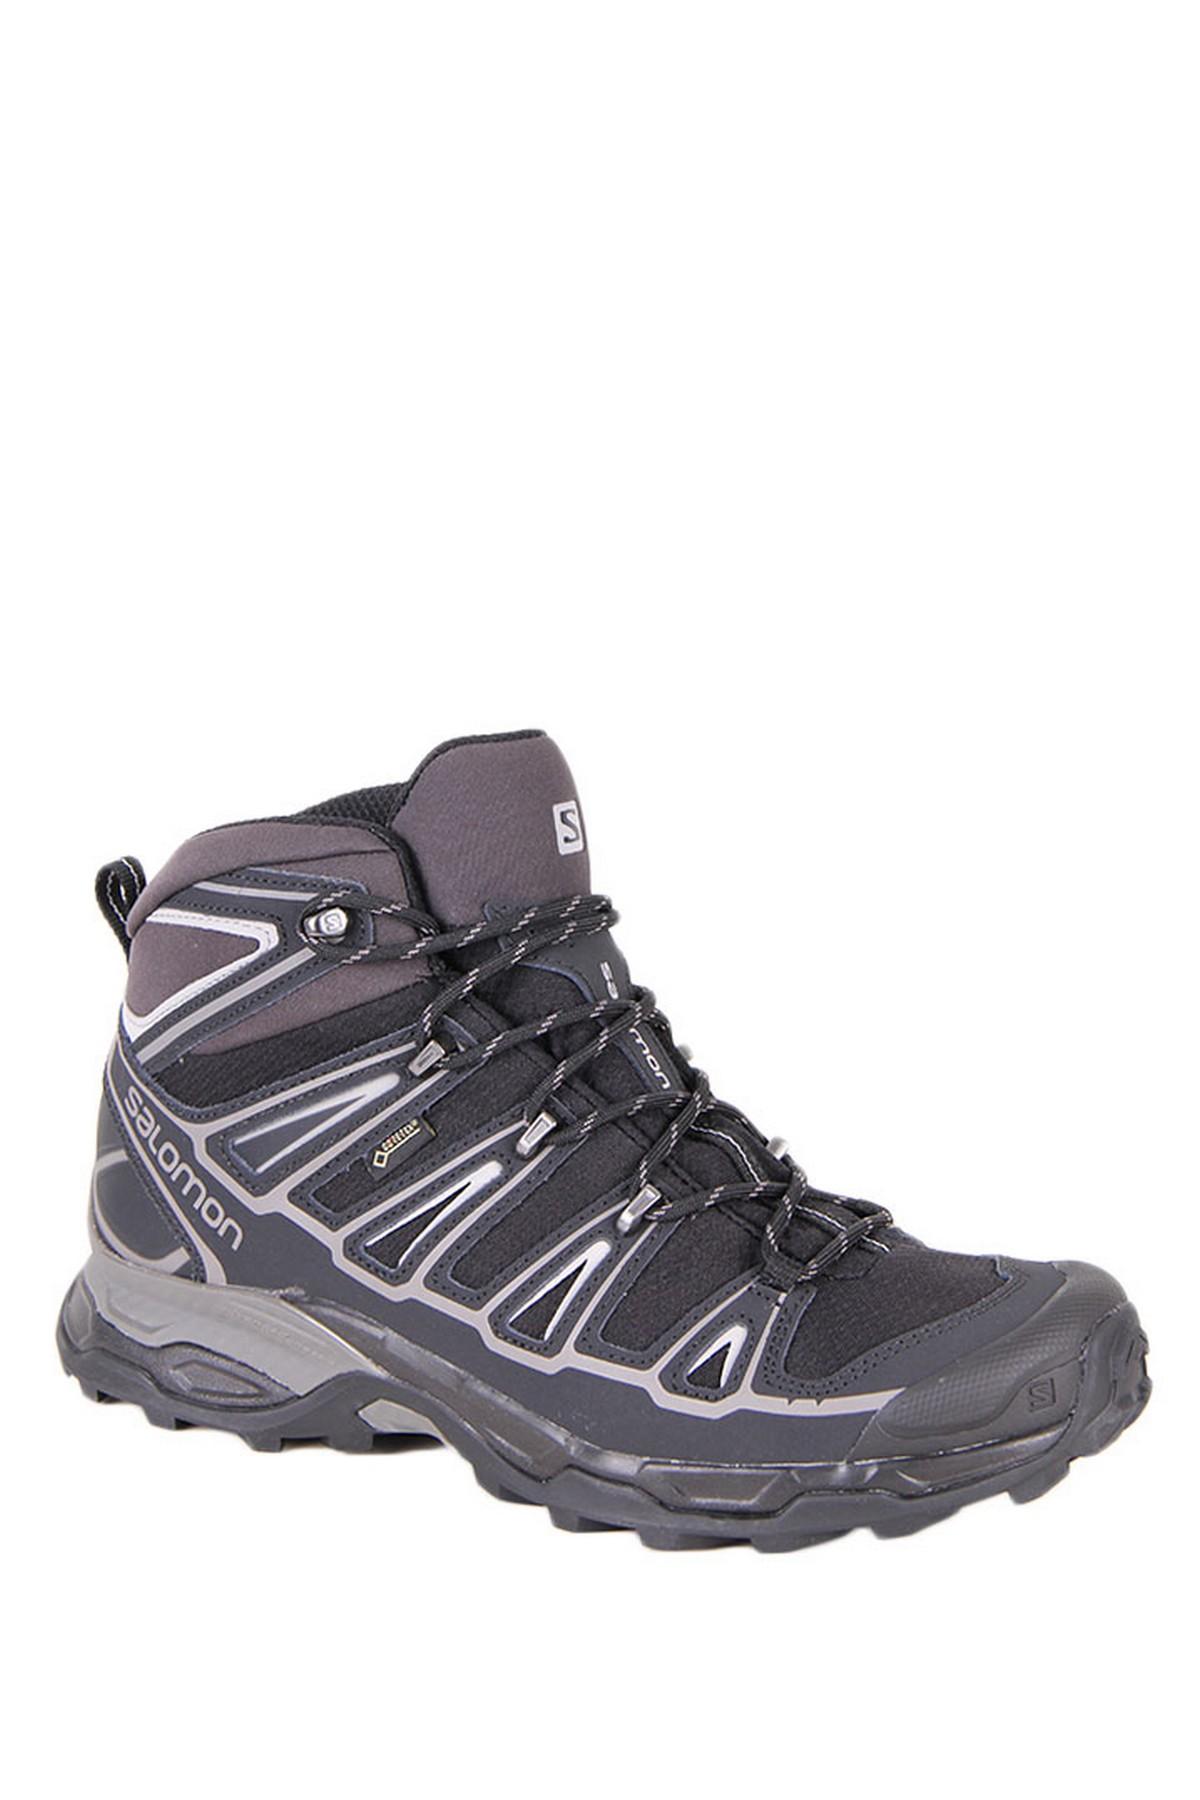 Salomon X Ultra MID 2 GTX Outdoor Ayakkabı (L37077000)